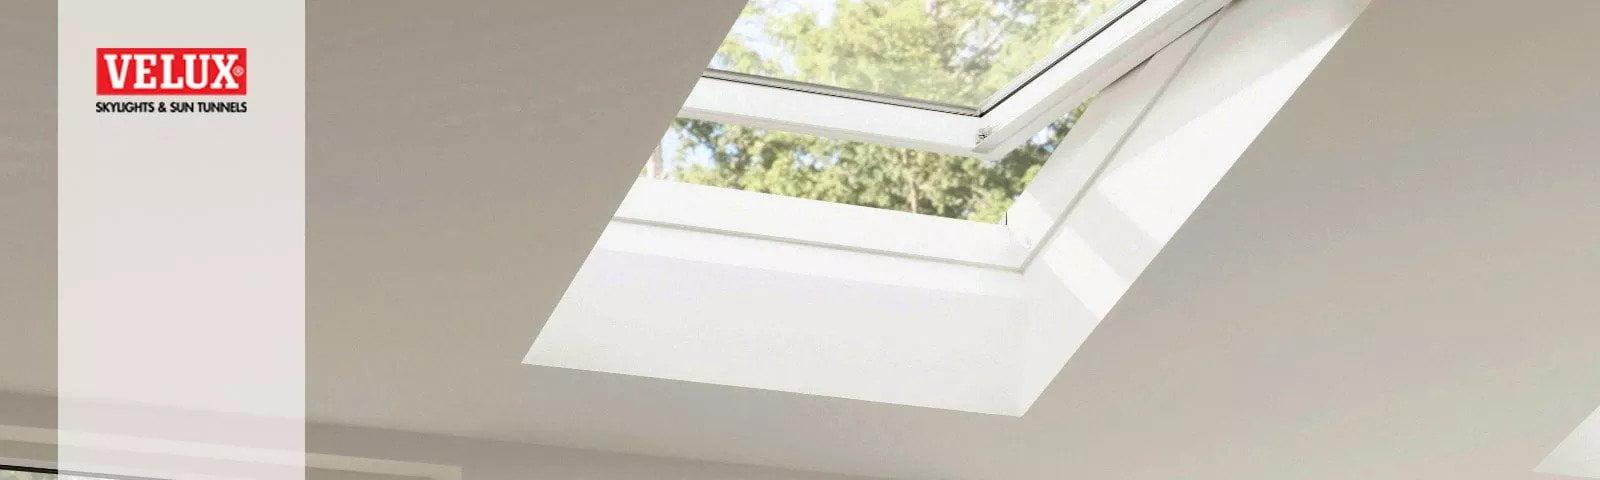 Skylight Roofing Surrey